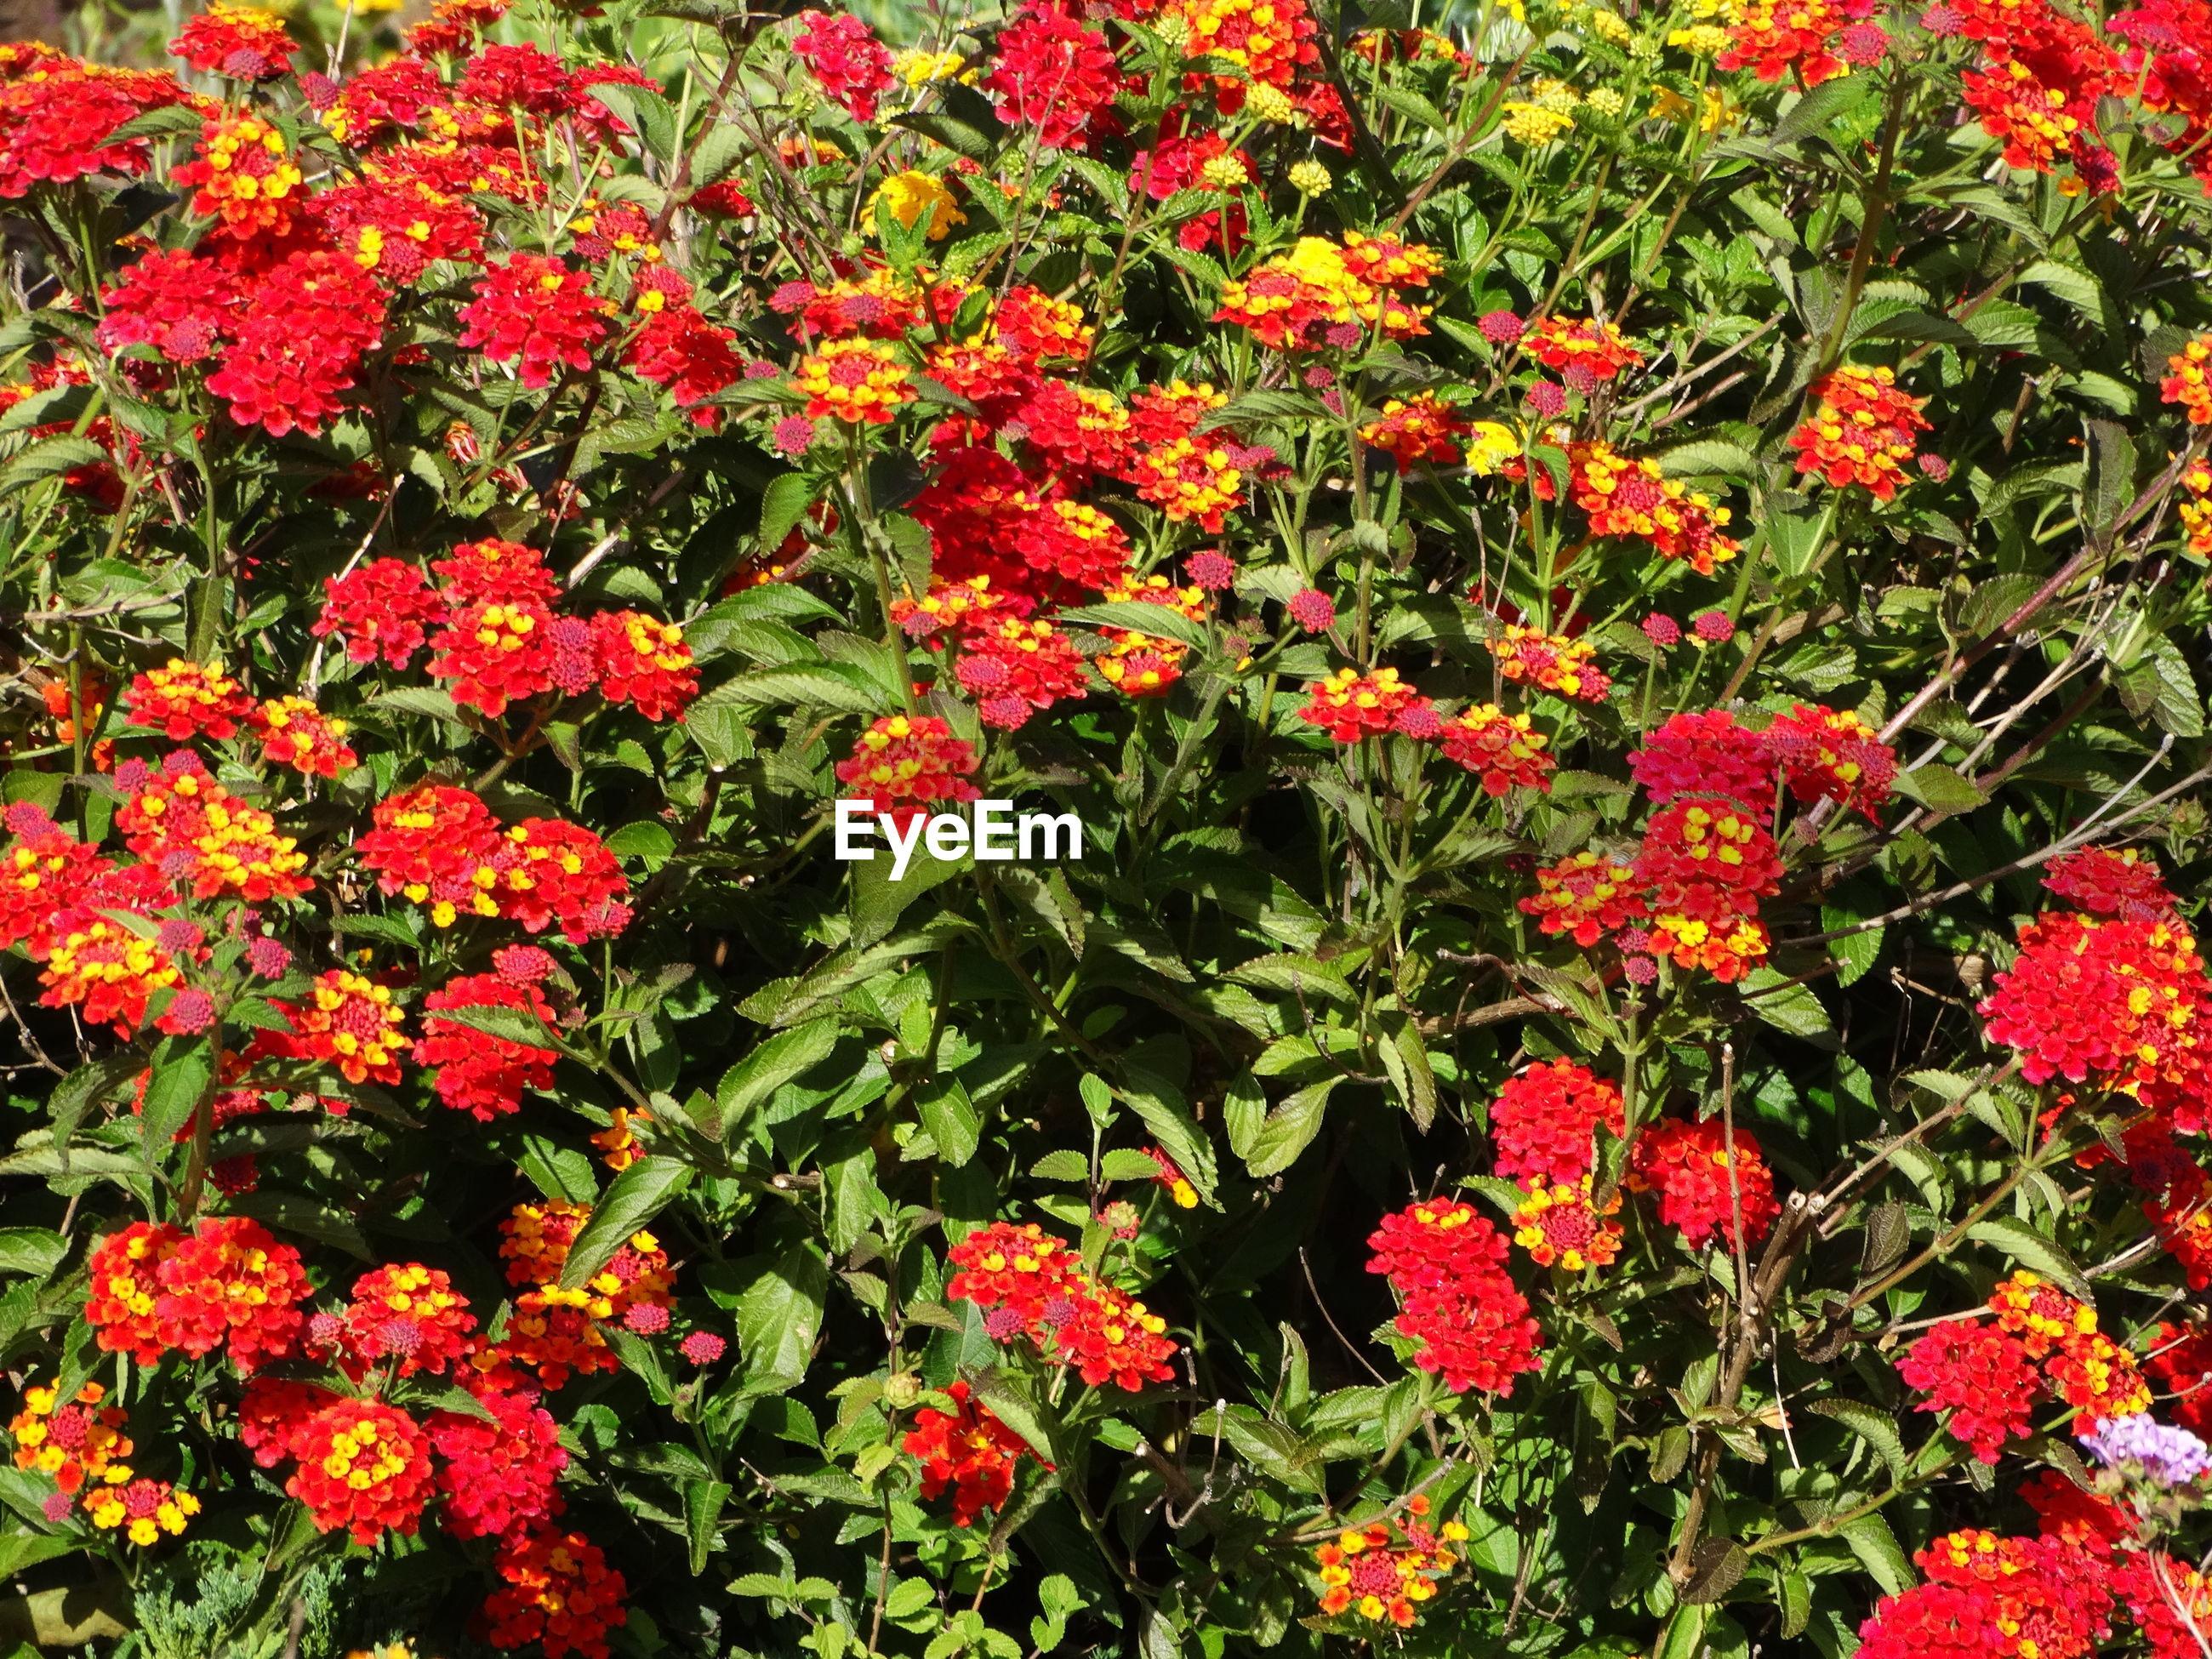 RED FLOWERS IN BLOOM